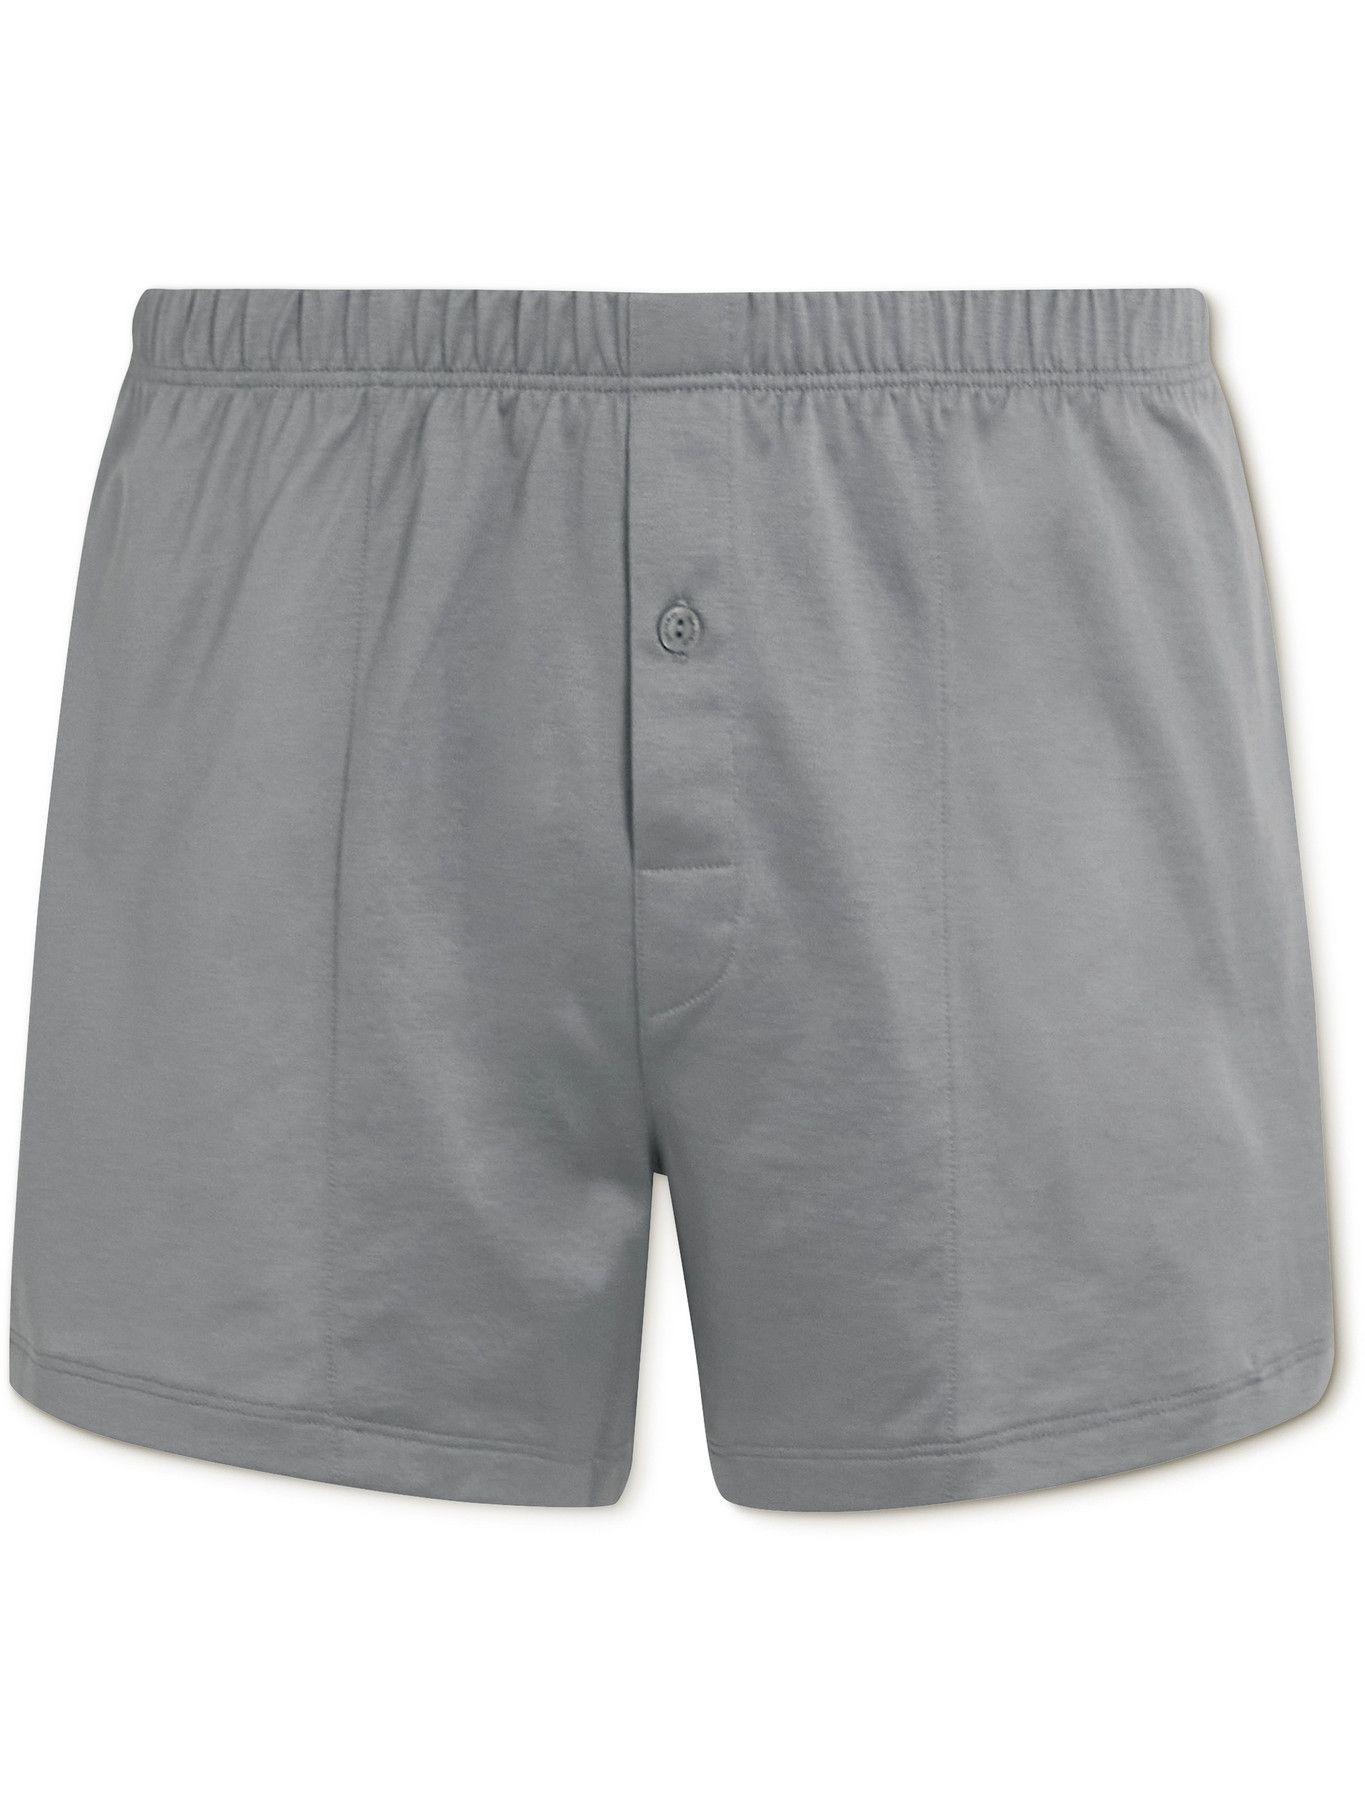 Photo: Hanro - Sporty Mercerised Cotton Boxer Shorts - Gray